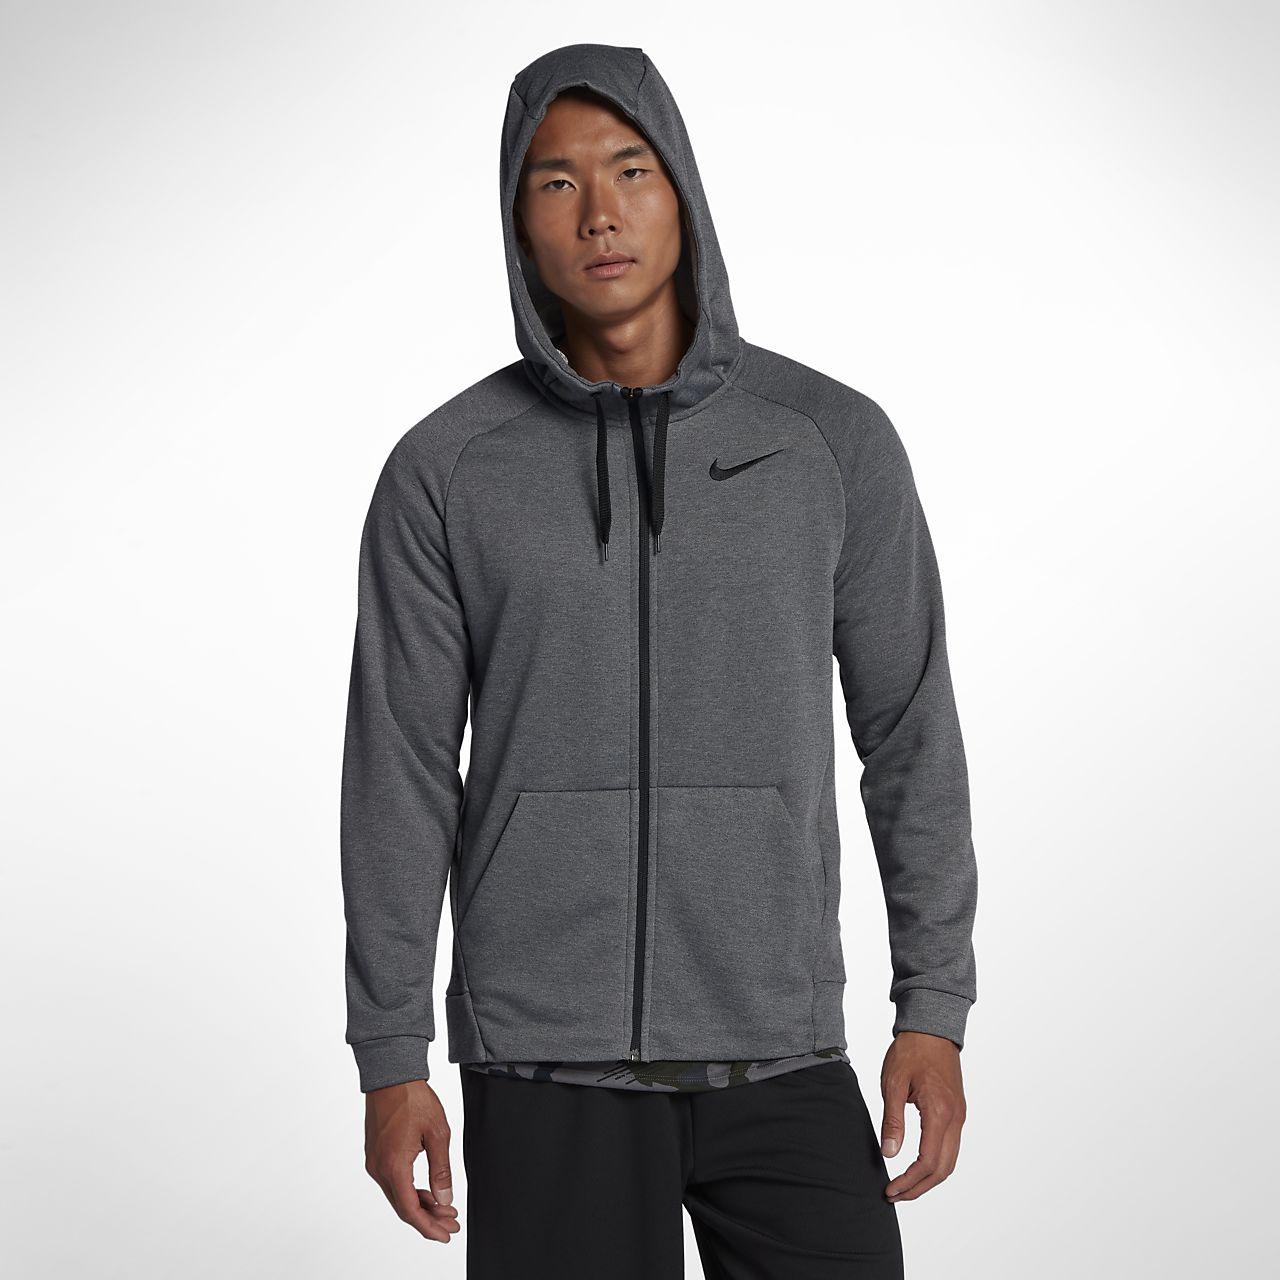 Dri Men's Zip Nike Training Full Hoodie Tscqhrxd Fit 8vNn0wPymO